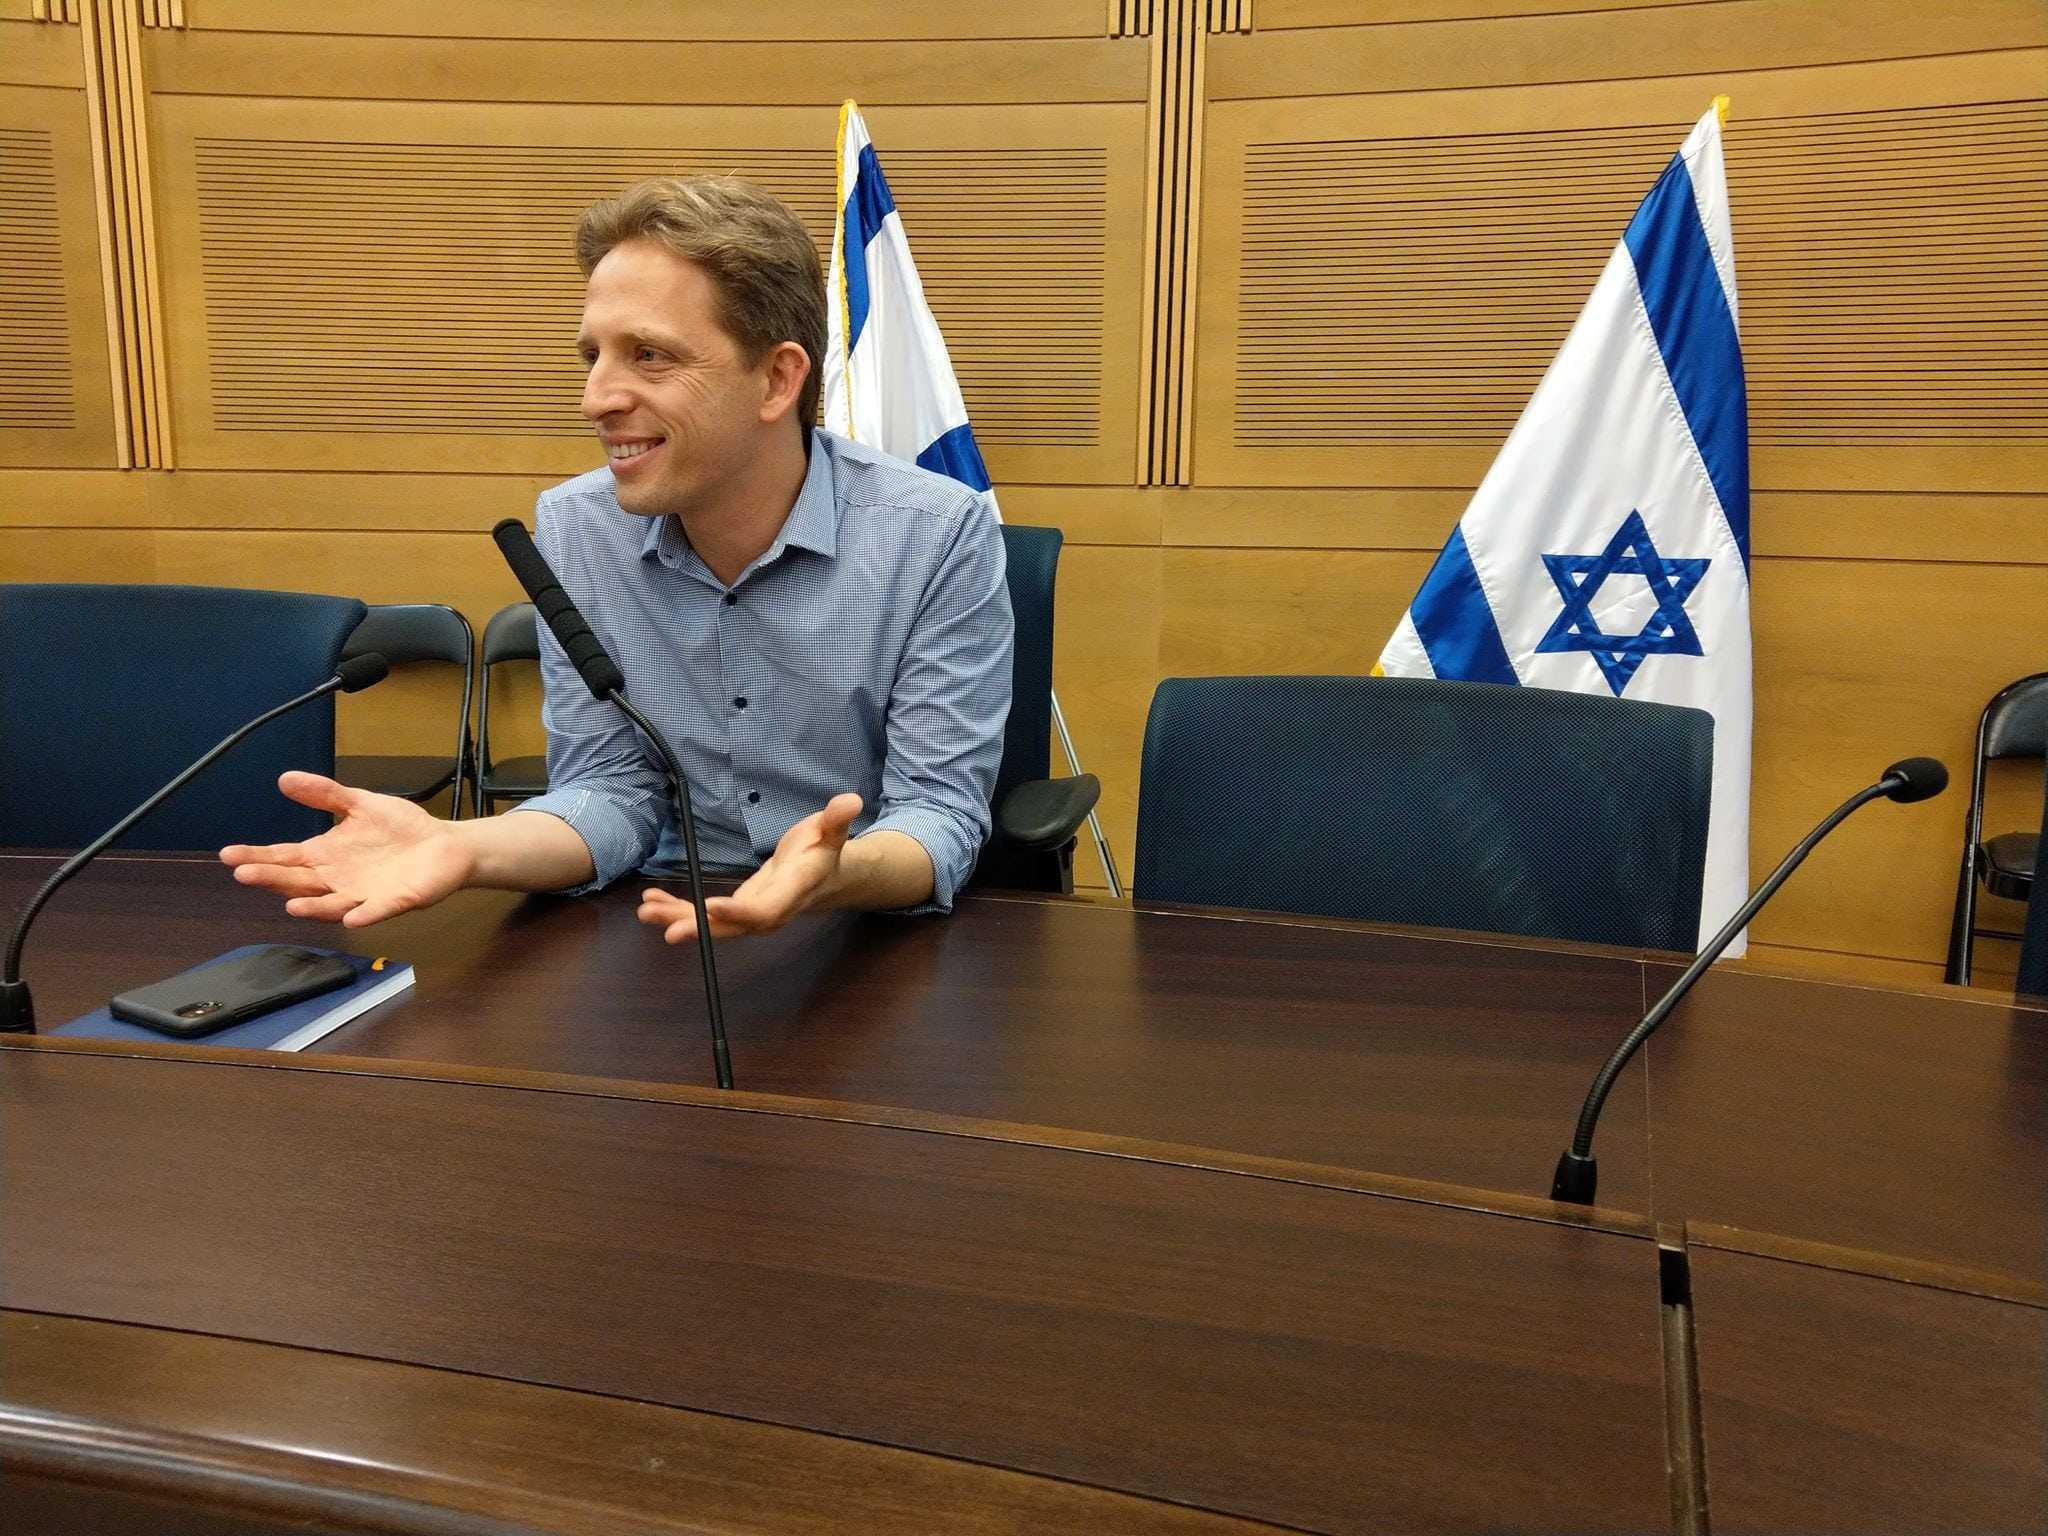 Knesset-medlem Roy Folkman, parlamentarisk leder for regjeringspartiet Kulanu. (Foto: Kjetil Ravn Hansen)